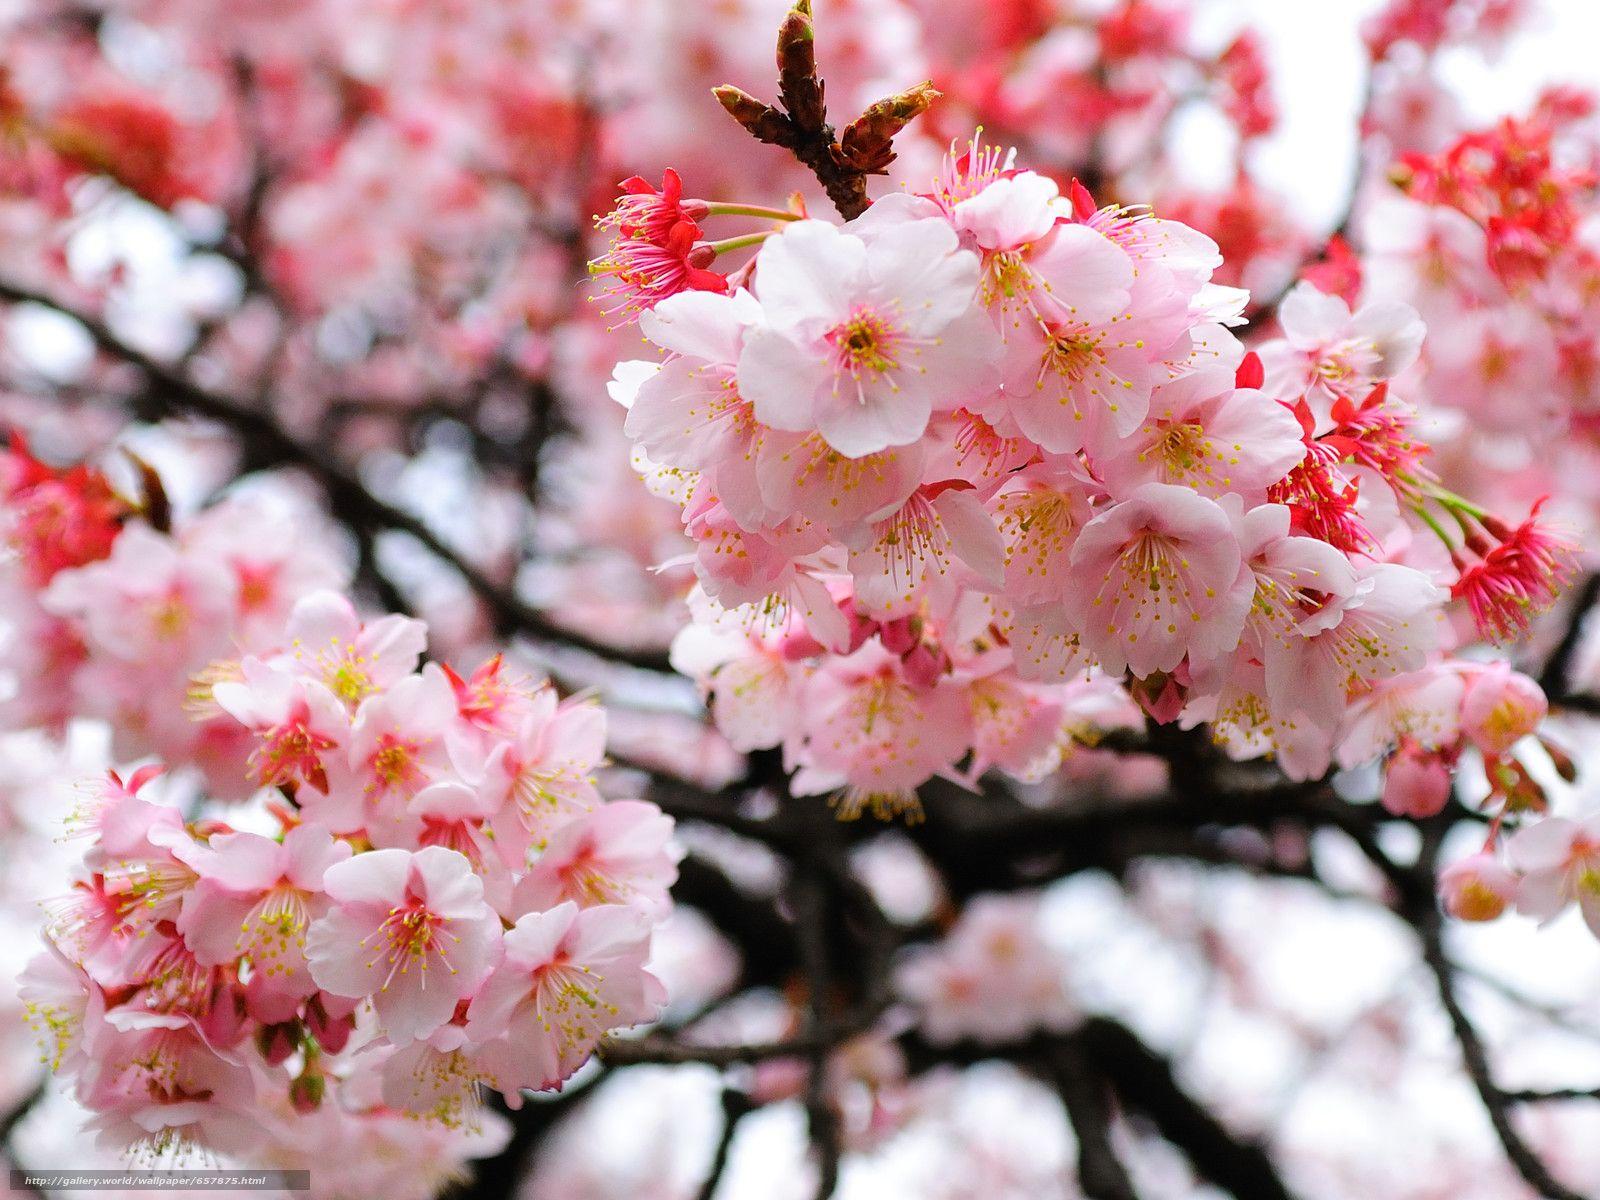 Download Wallpaper Flowers Flowering Color Branch Free Desktop Wallpaper In The Resolution 3029x2272 Pictur Flowers Free Desktop Wallpaper Spring Fruit